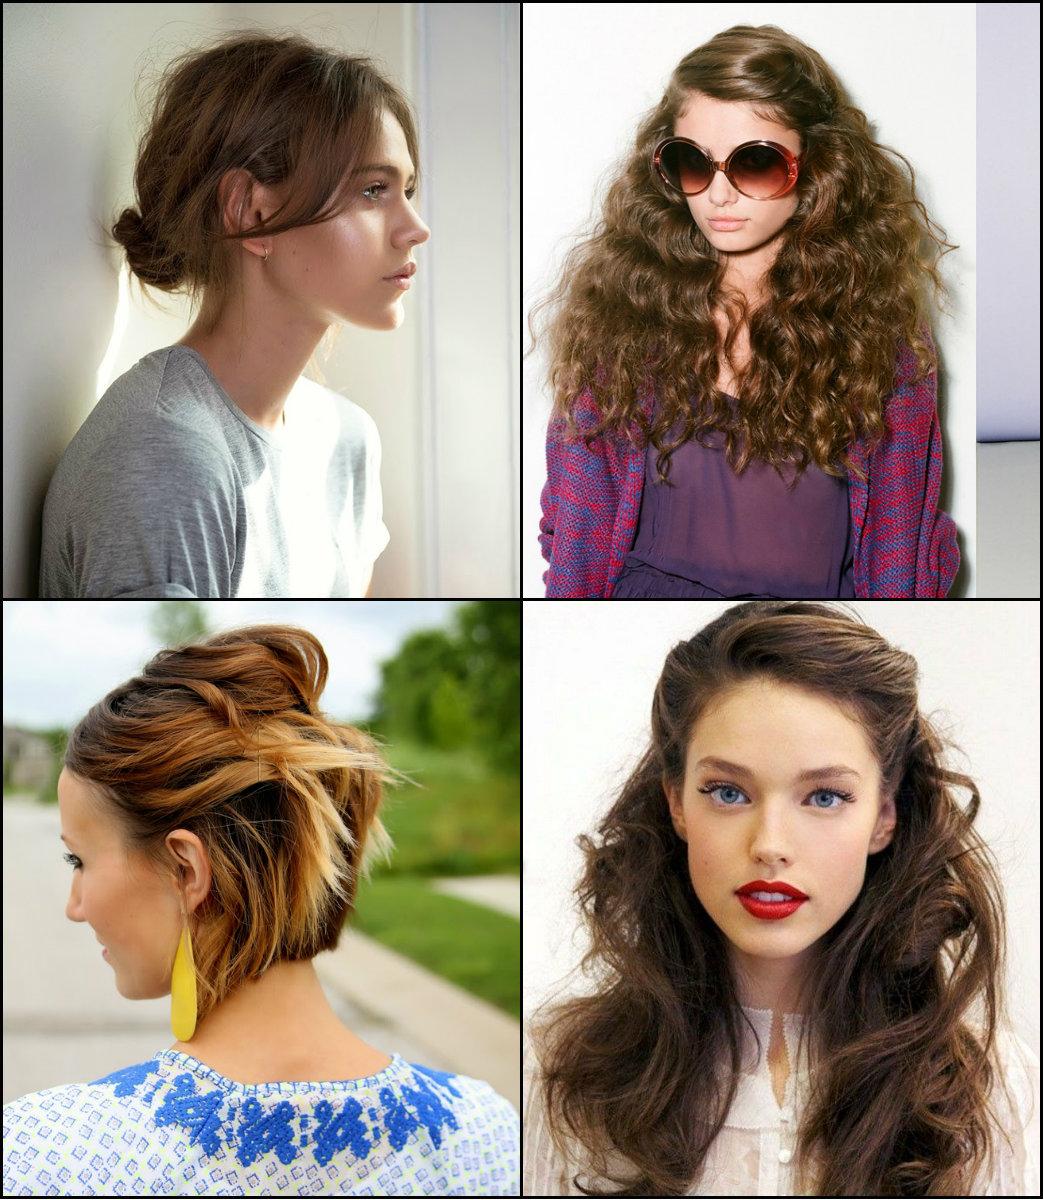 Summer Wet Hair Trends To Look Cool & Fresh of 10 by Karen